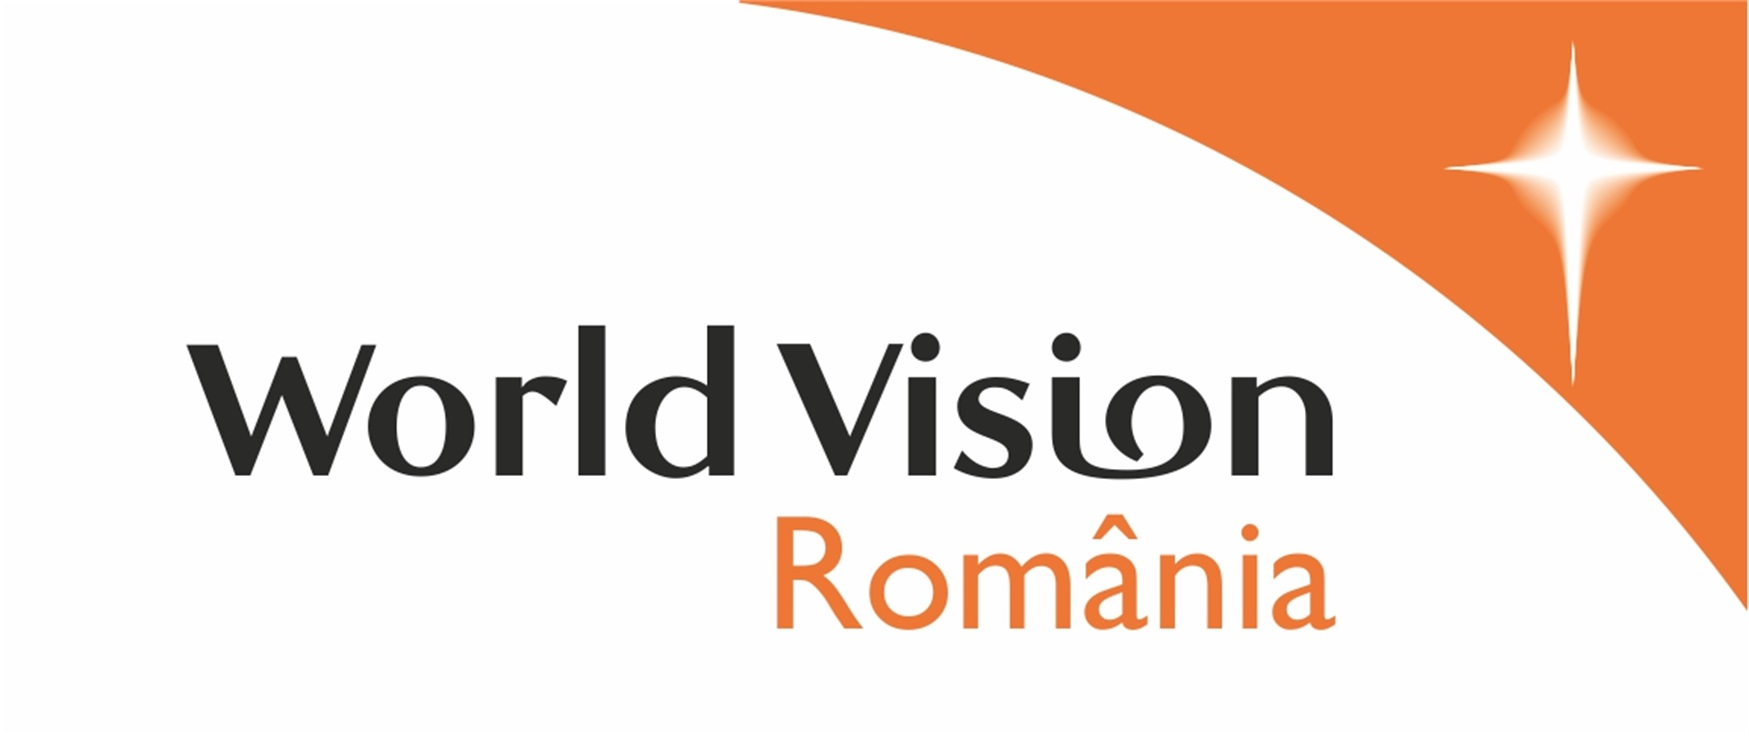 Punct de vedere World Vision România referitor la rezultatele PISA 2018